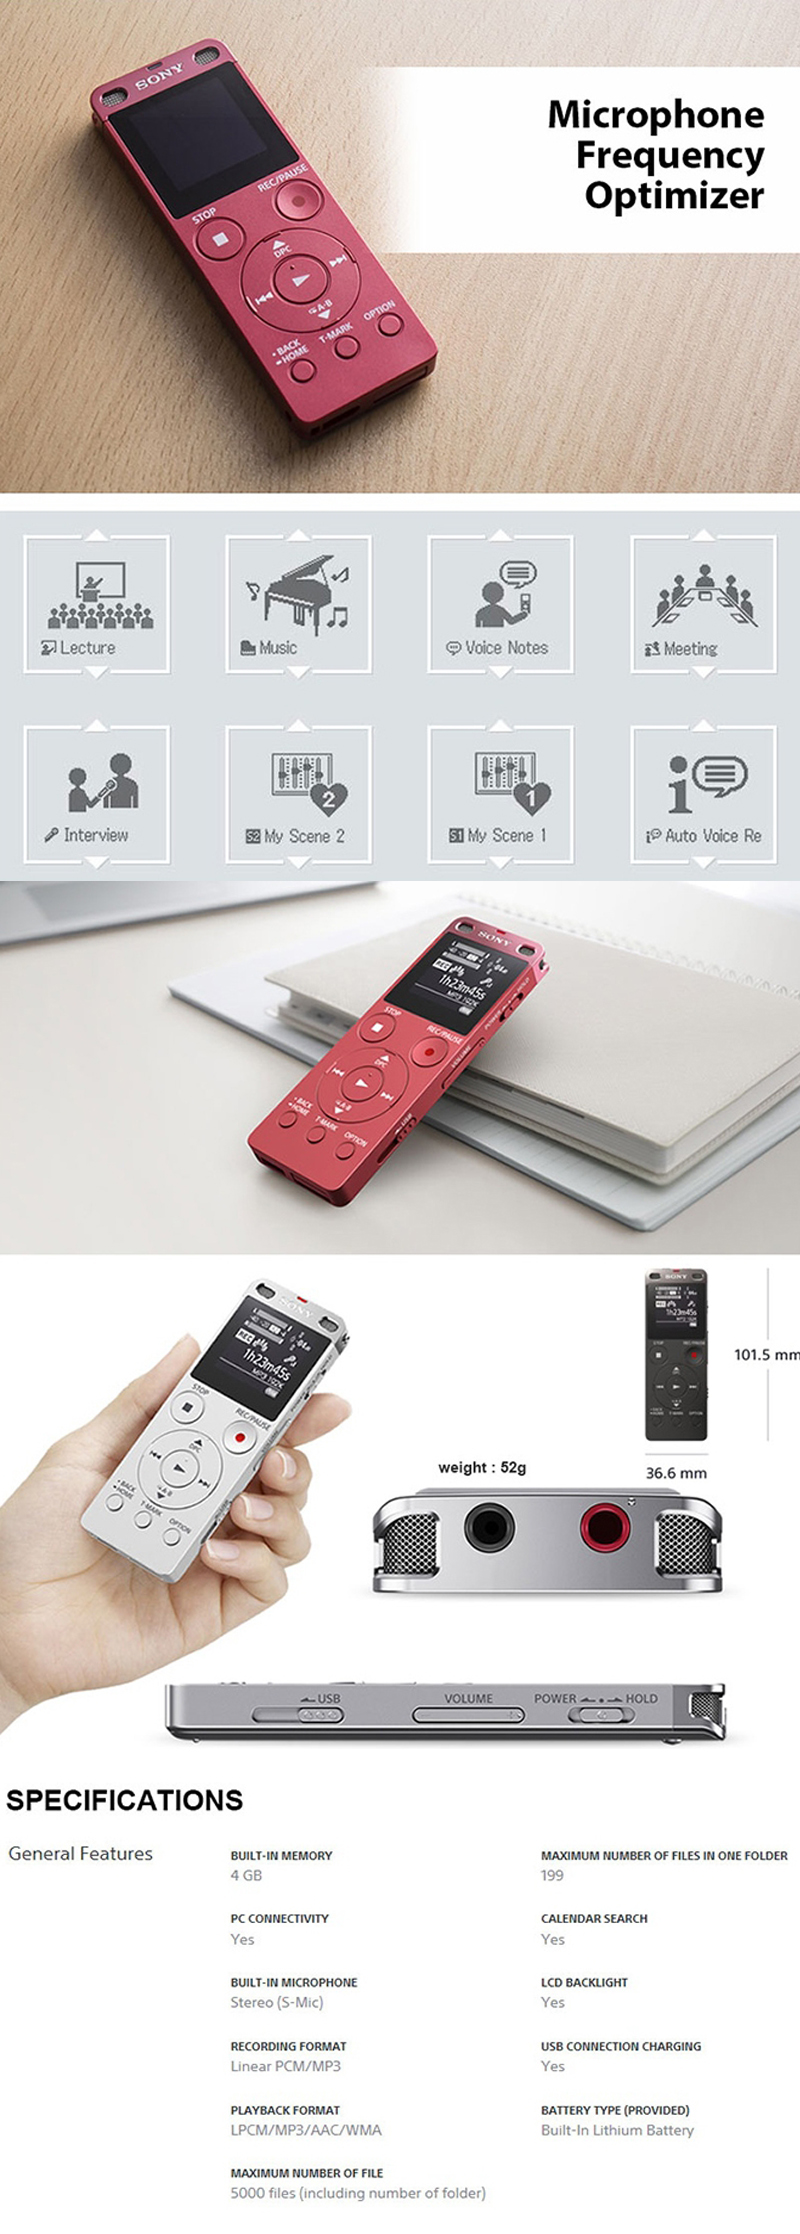 Sony Icd Ux560f 4gb Ux Series Digital Voice Recorder Daftar Harga Tx800 Tx Stereo Ic Mp3